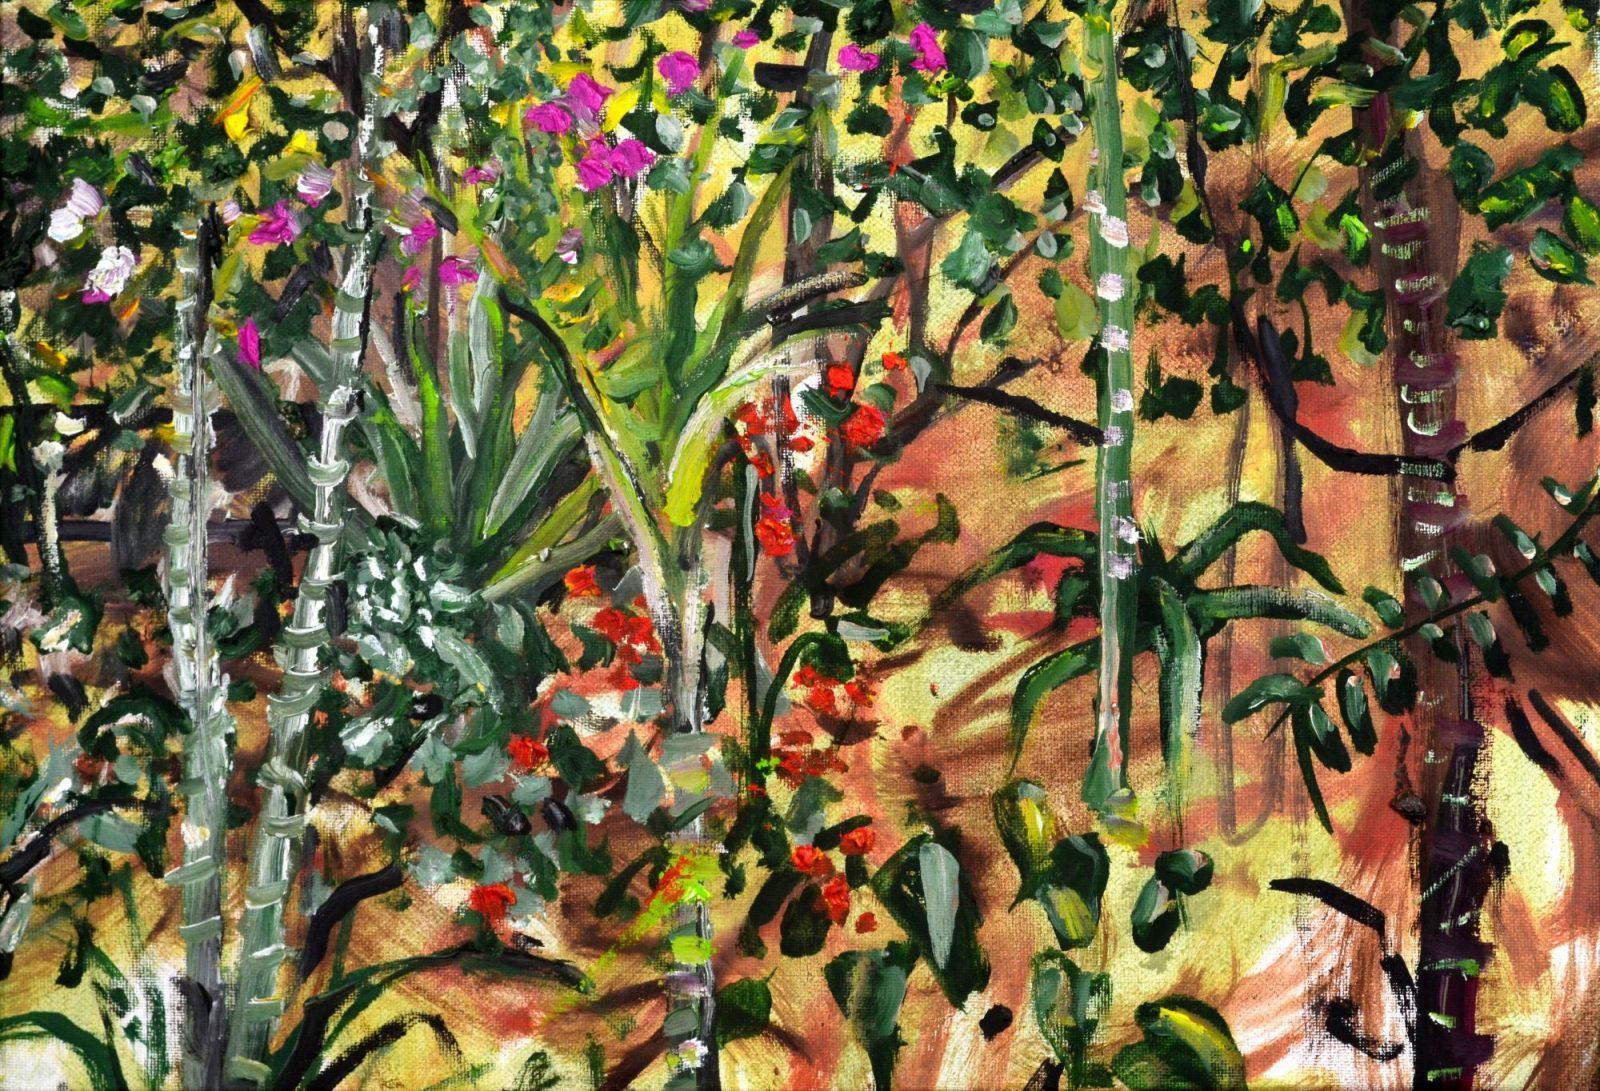 franyo aatoth: Garden Series 23.